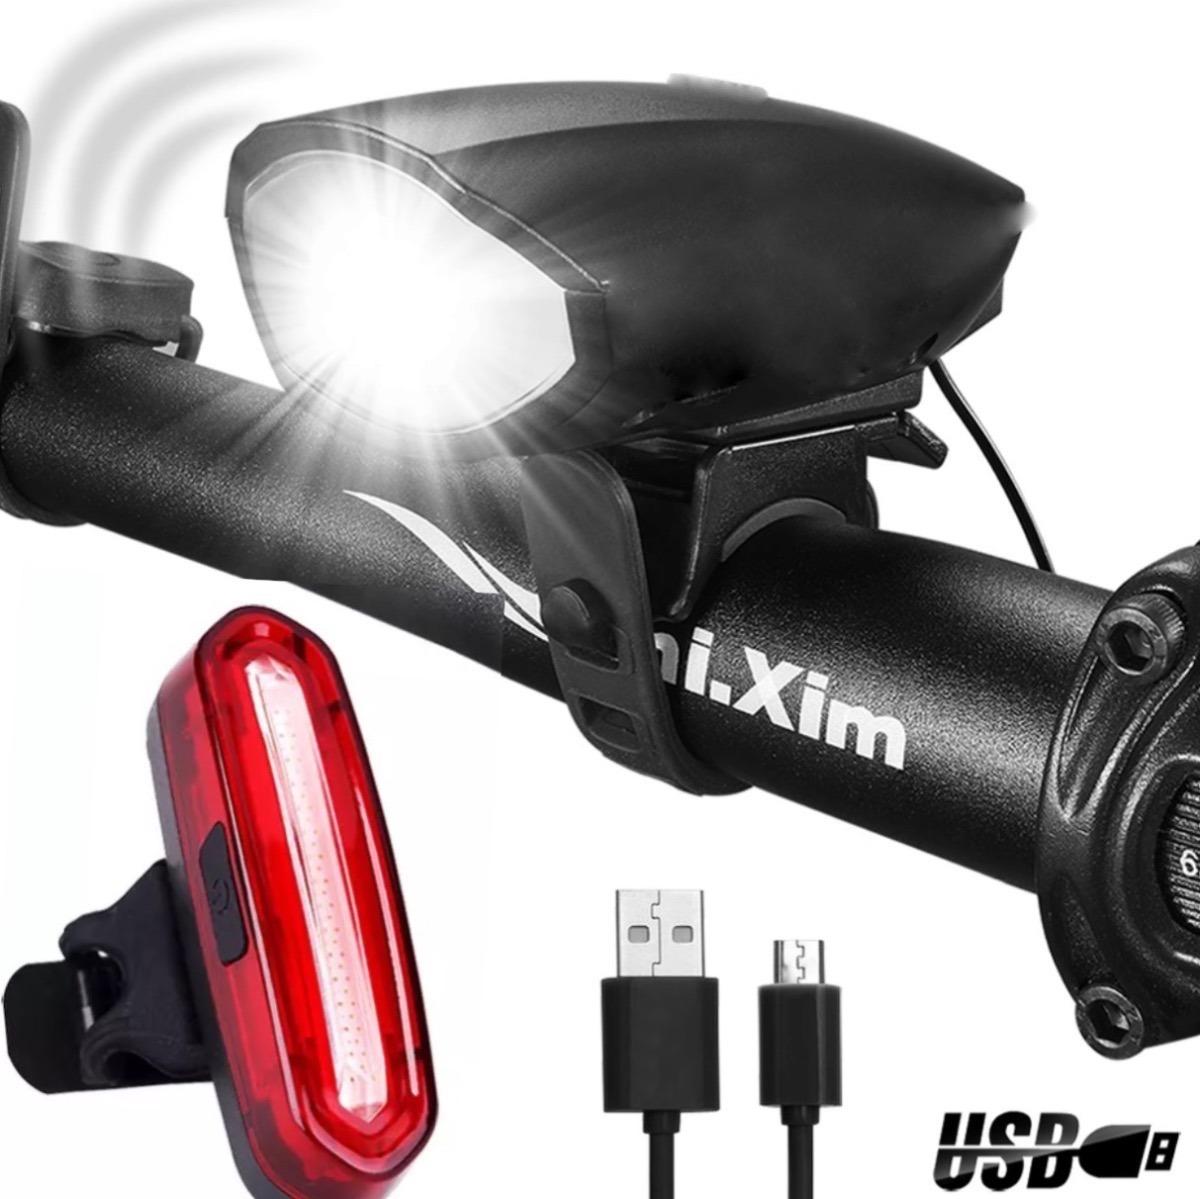 1491bf8cd52a8 kit luz bicicleta delantera con cláxon + luz trasera usb c9. Cargando zoom.